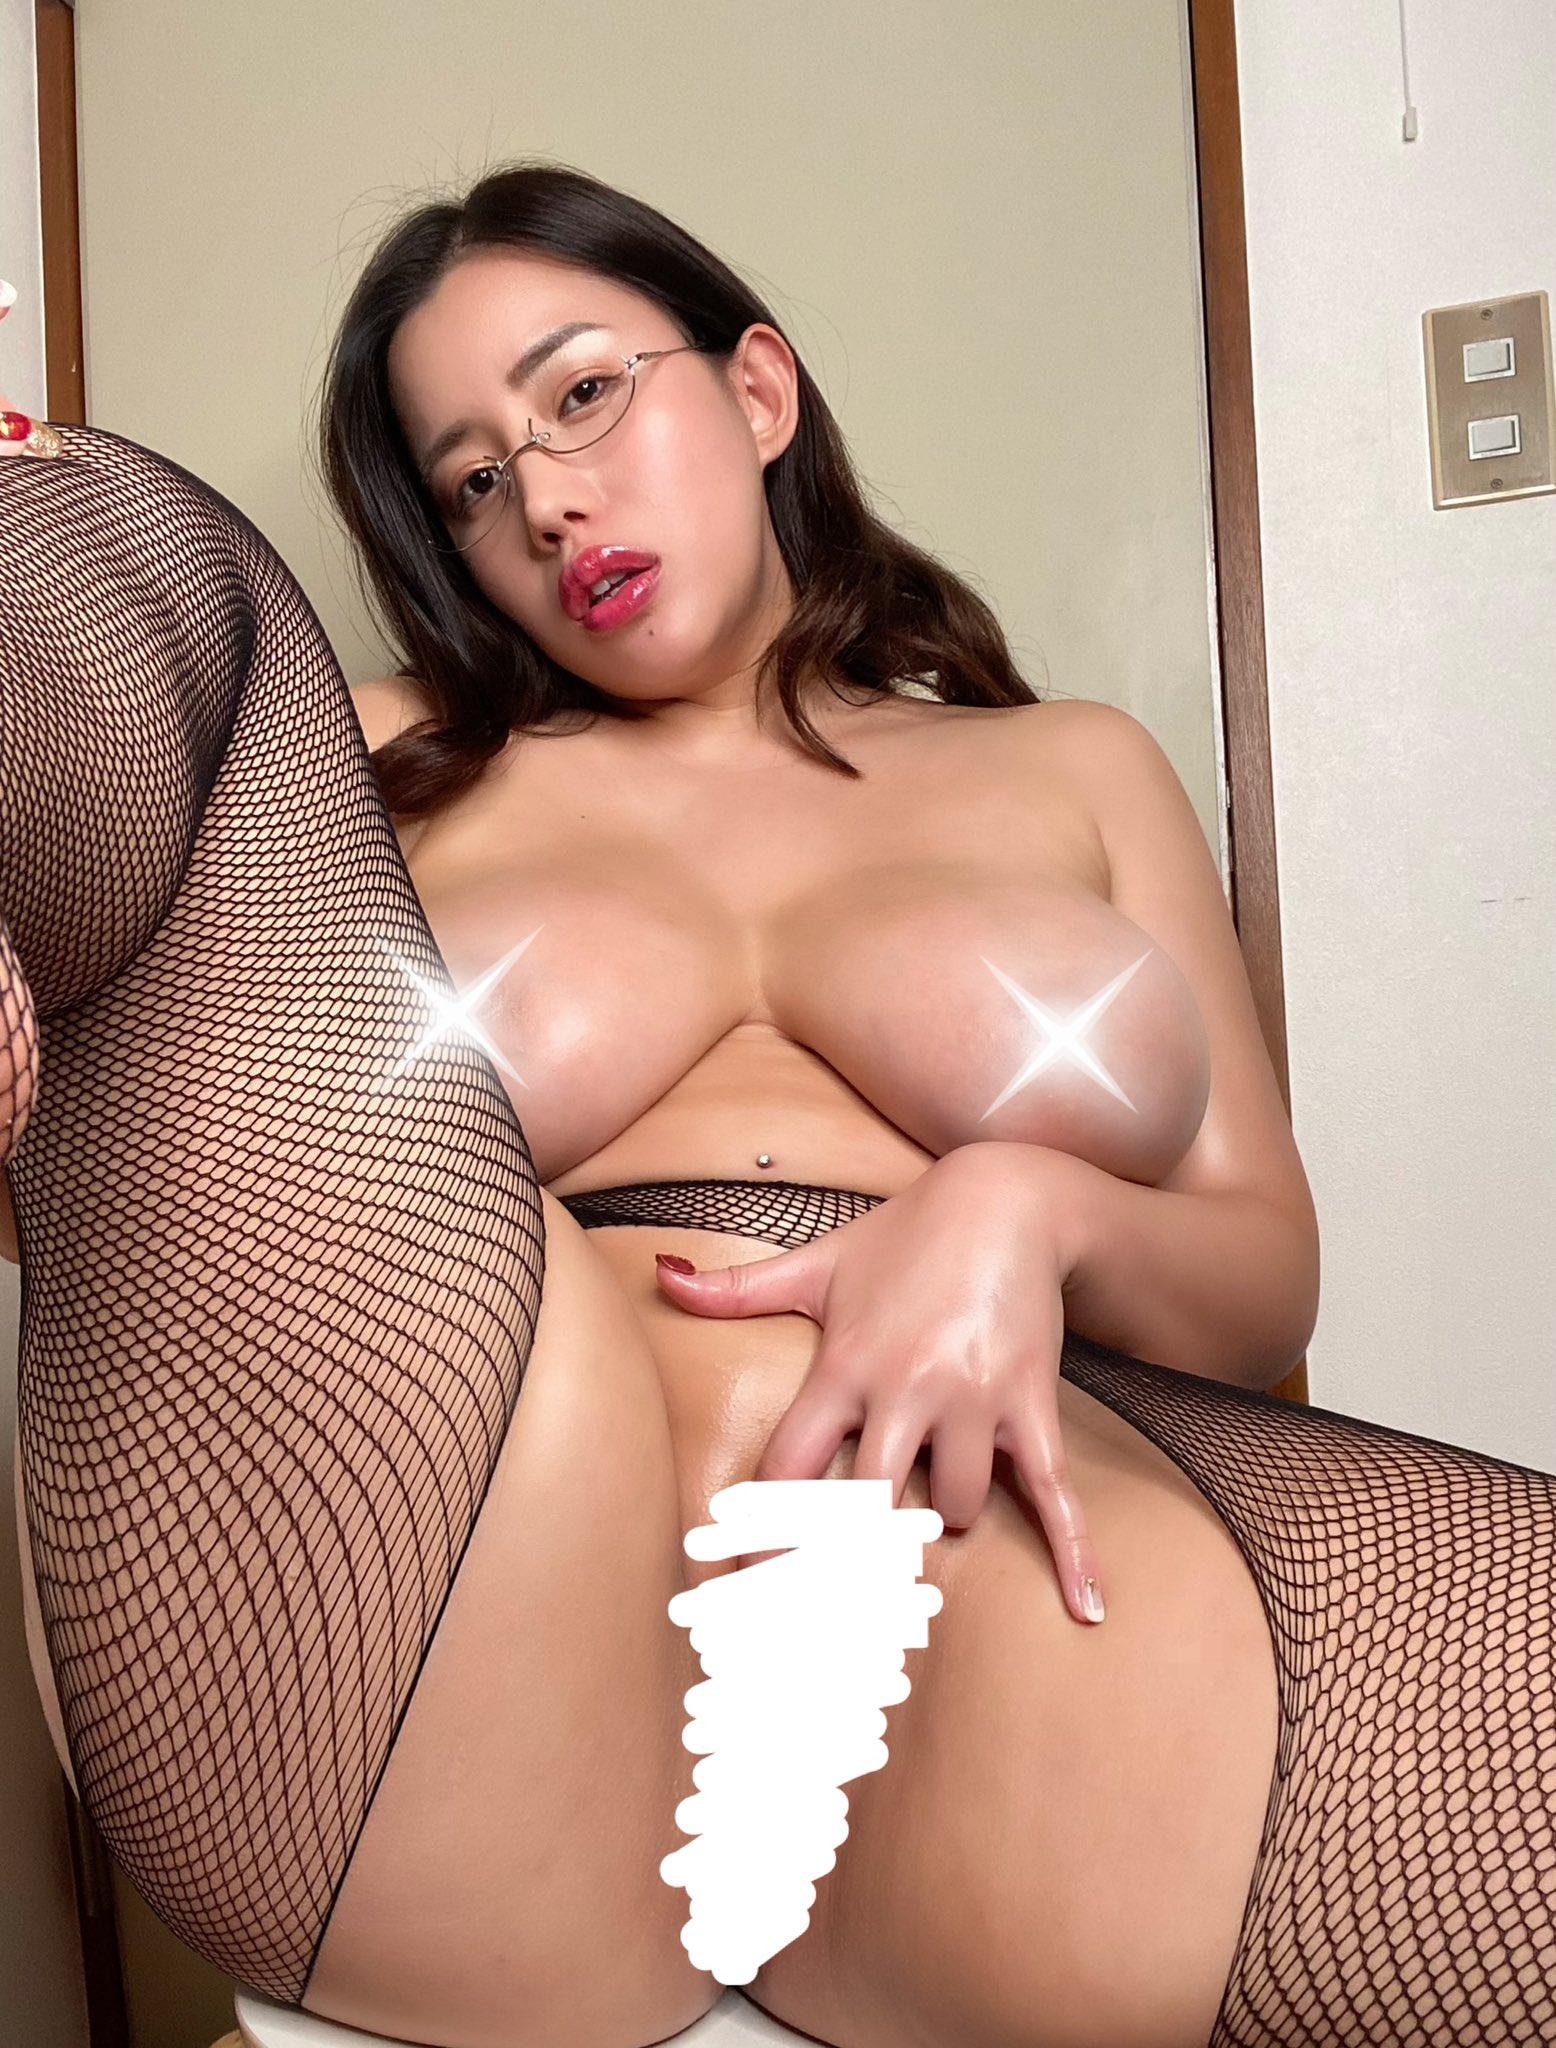 Nagai Maria Nude Leaked (3 Videos + 136 Photos) 299